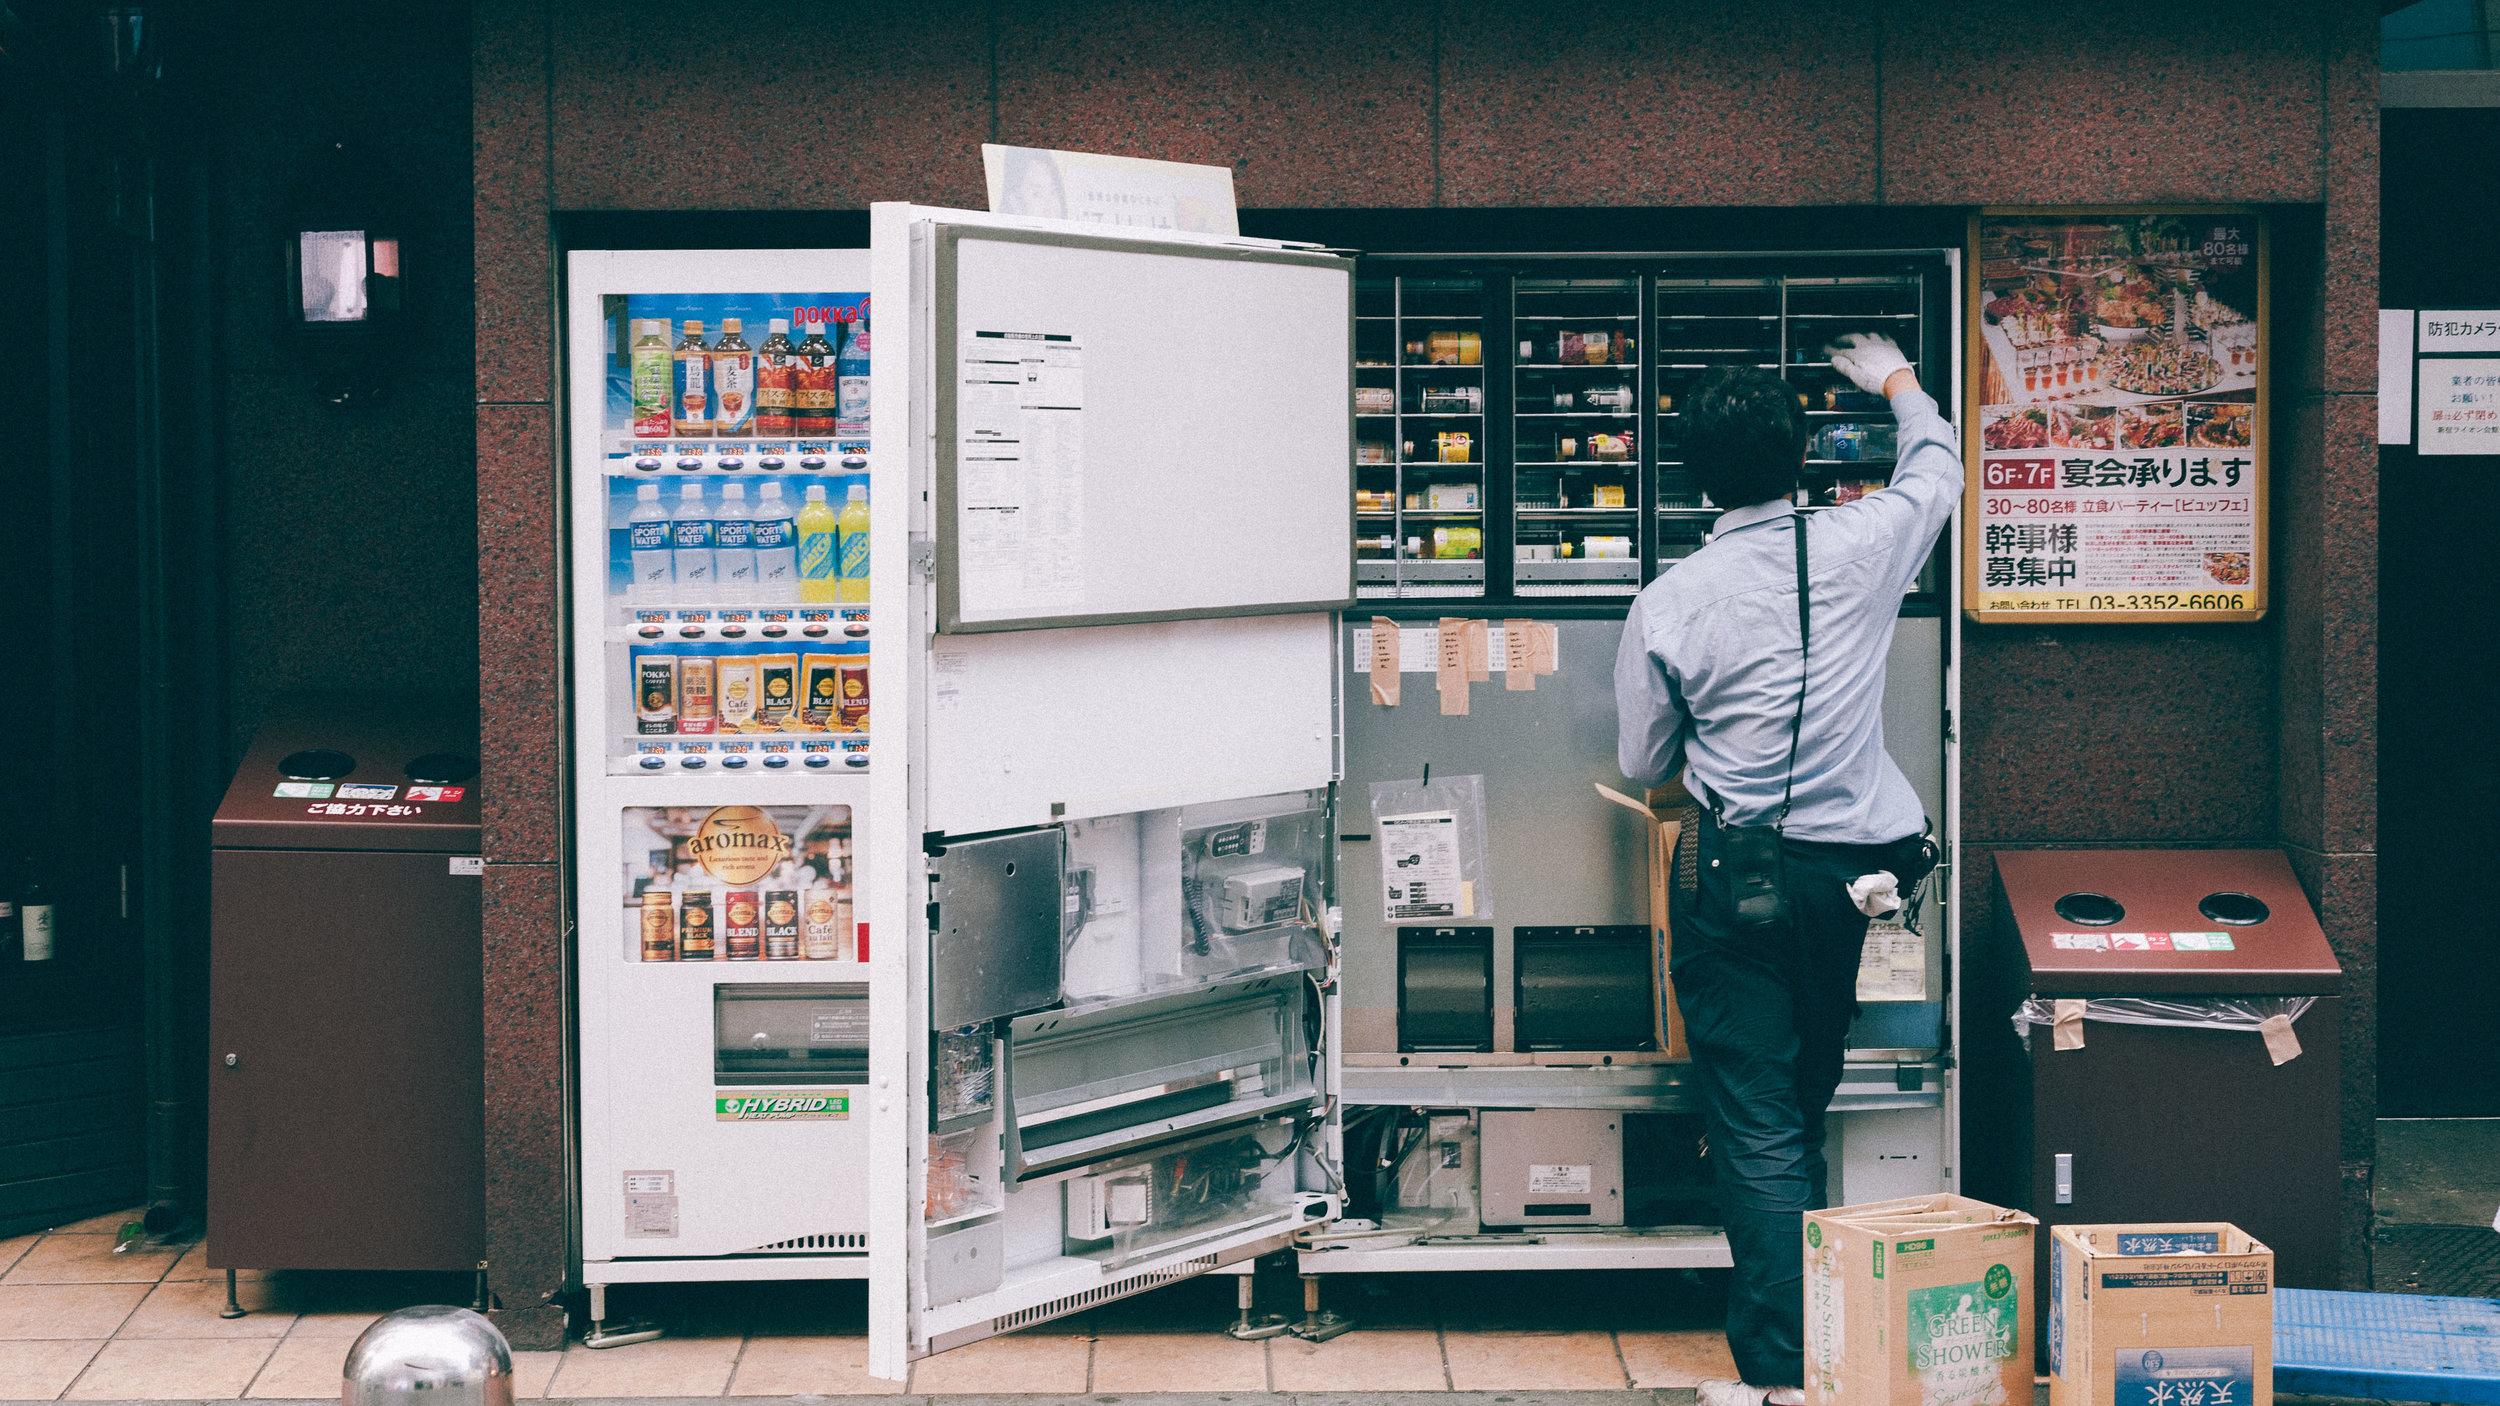 chaning-vending-machine-tokyo-japan.jpg